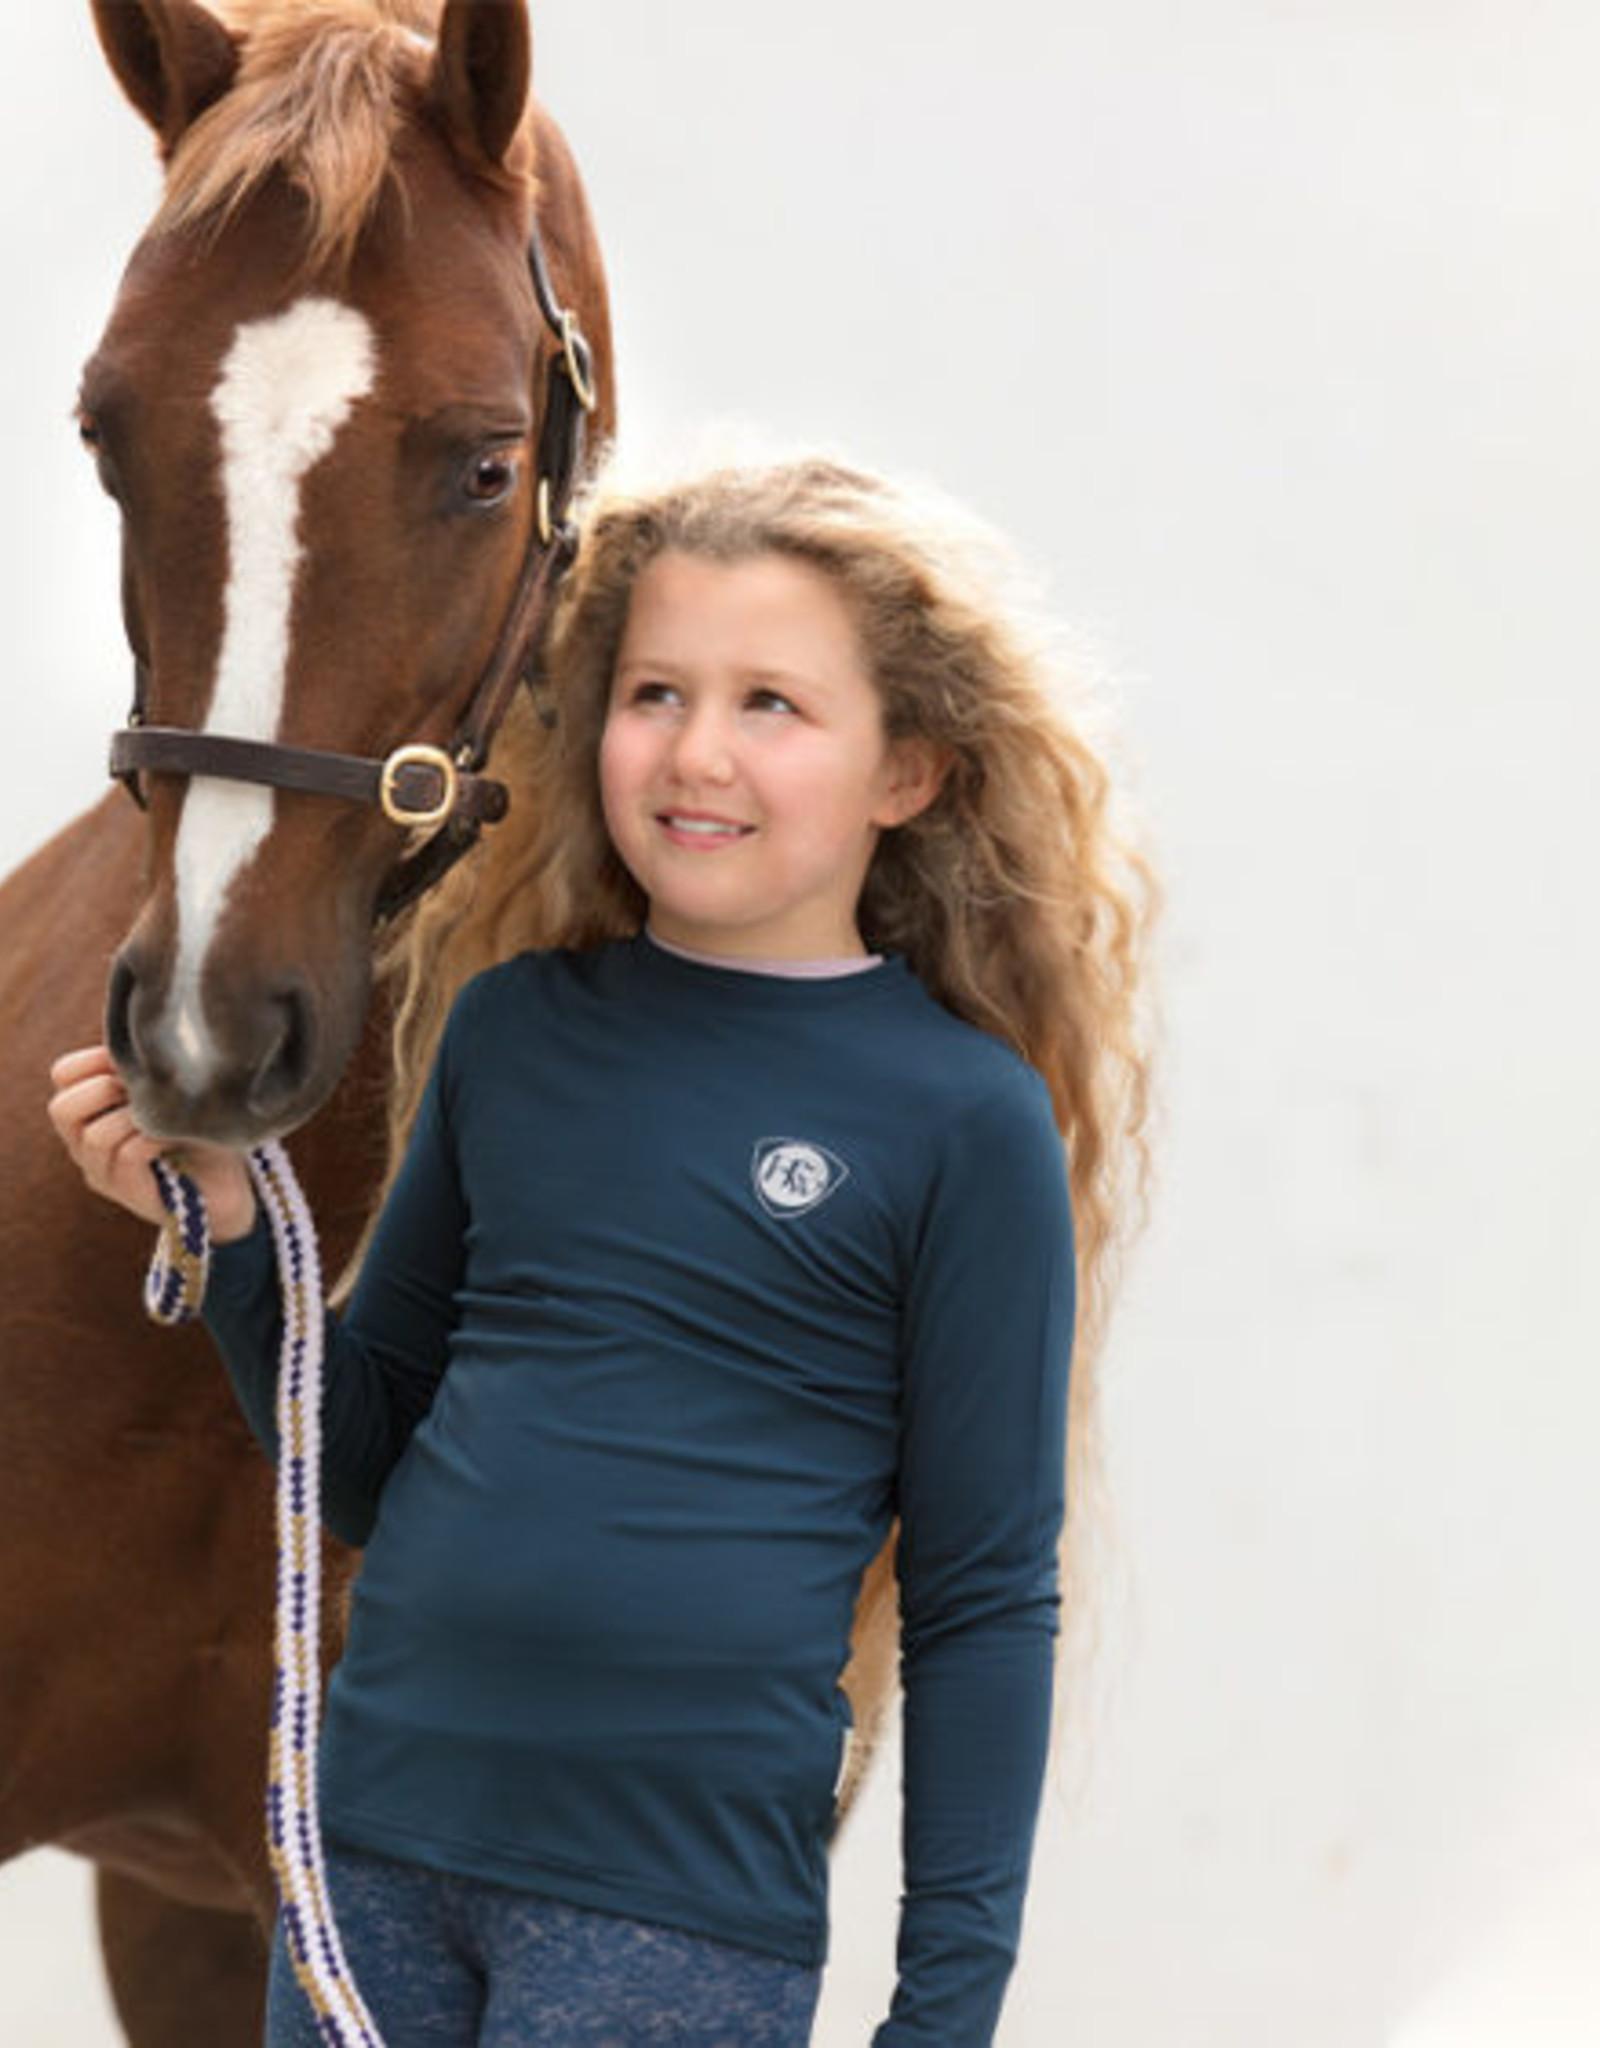 HORSEWARE IRELAND KIDS BASELAYER